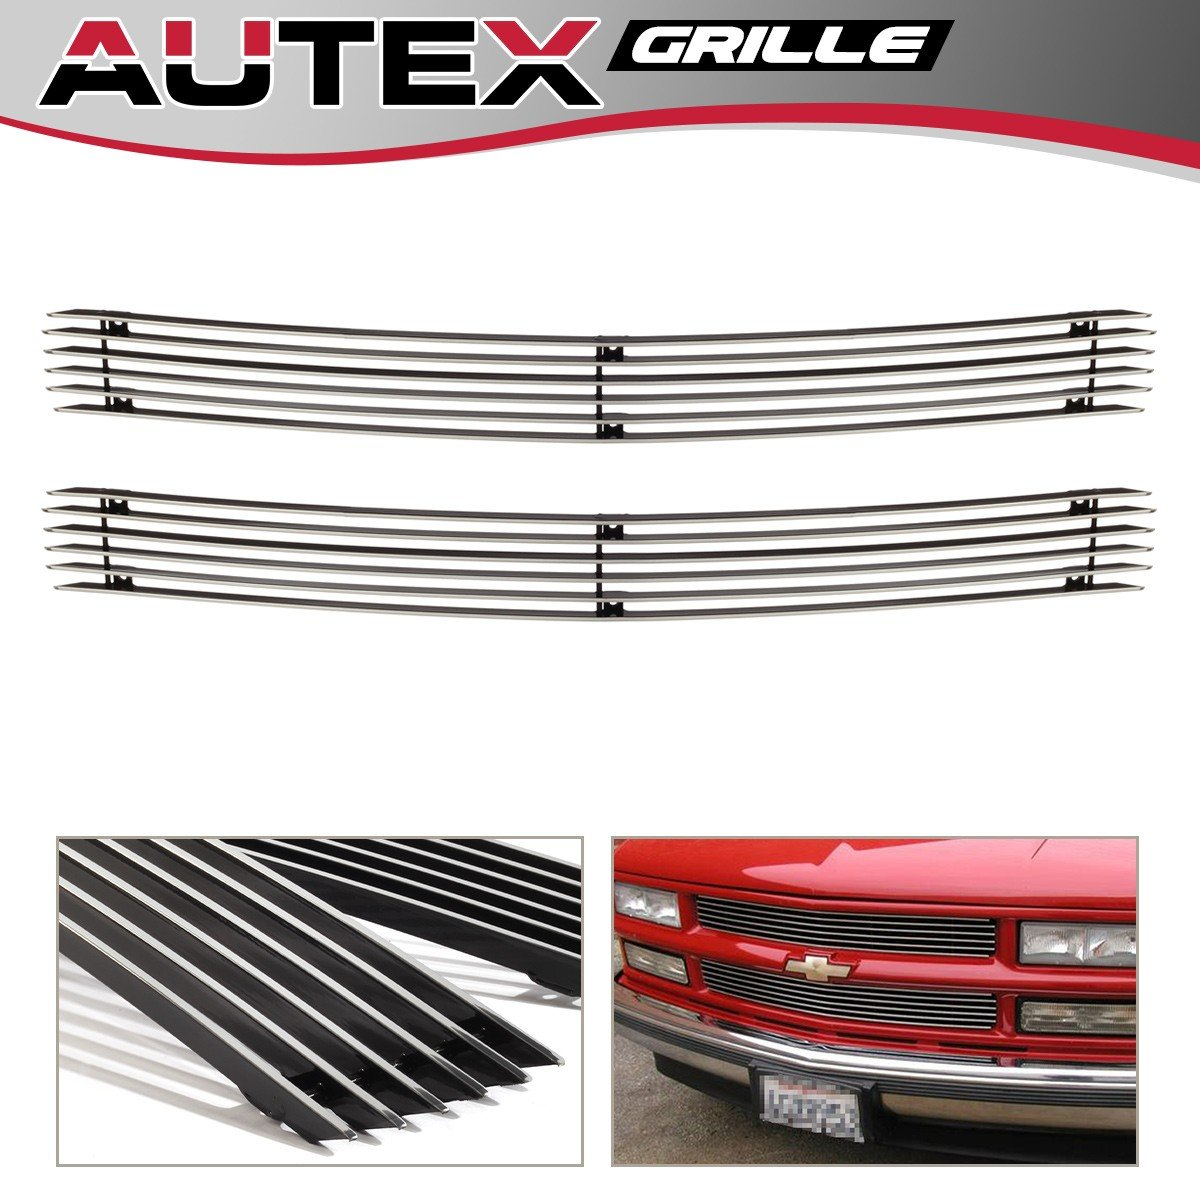 1994-1999 Chevy Blazer AUTEX 2pcs Main Upper Billet Grille Insert Chrome Aluminum C65706A Compatible With 1994-1999 Chevy C//K Pickup 1994-1999 Chevy Suburban Tahoe